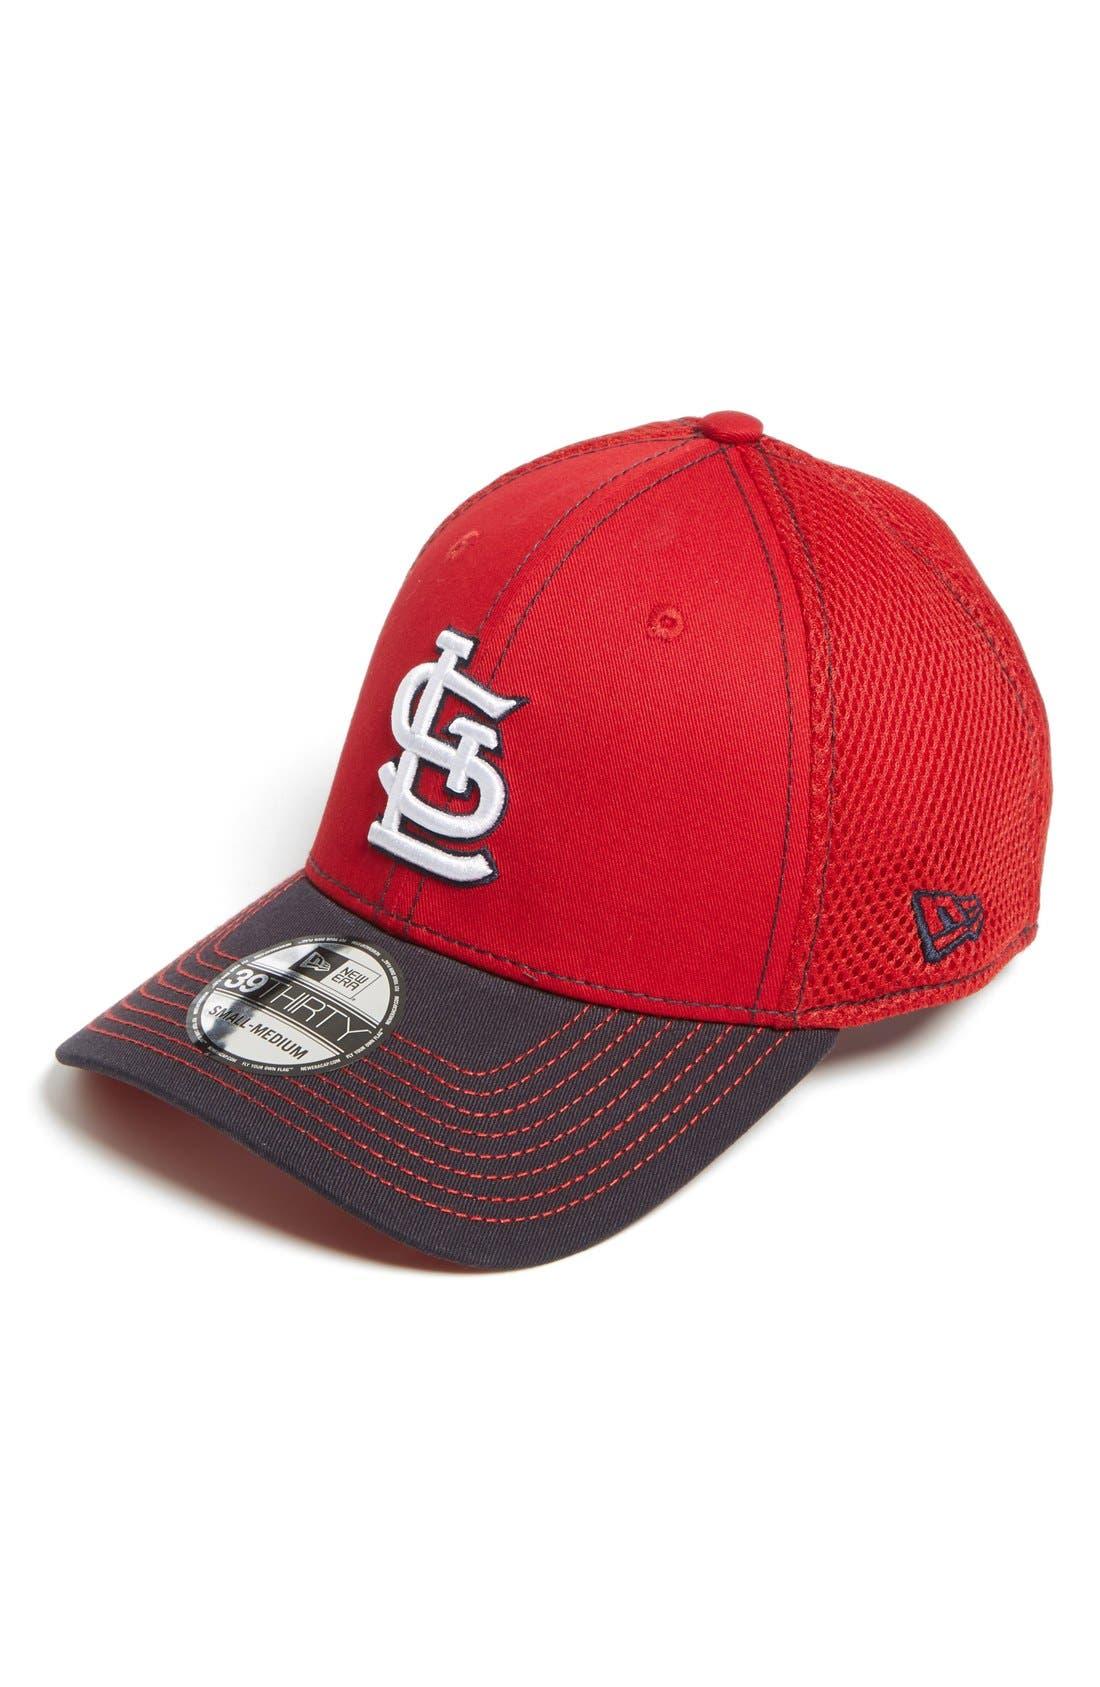 Alternate Image 1 Selected - New Era Cap '2Tone Neo - St. Louis Cardinals' Baseball Cap